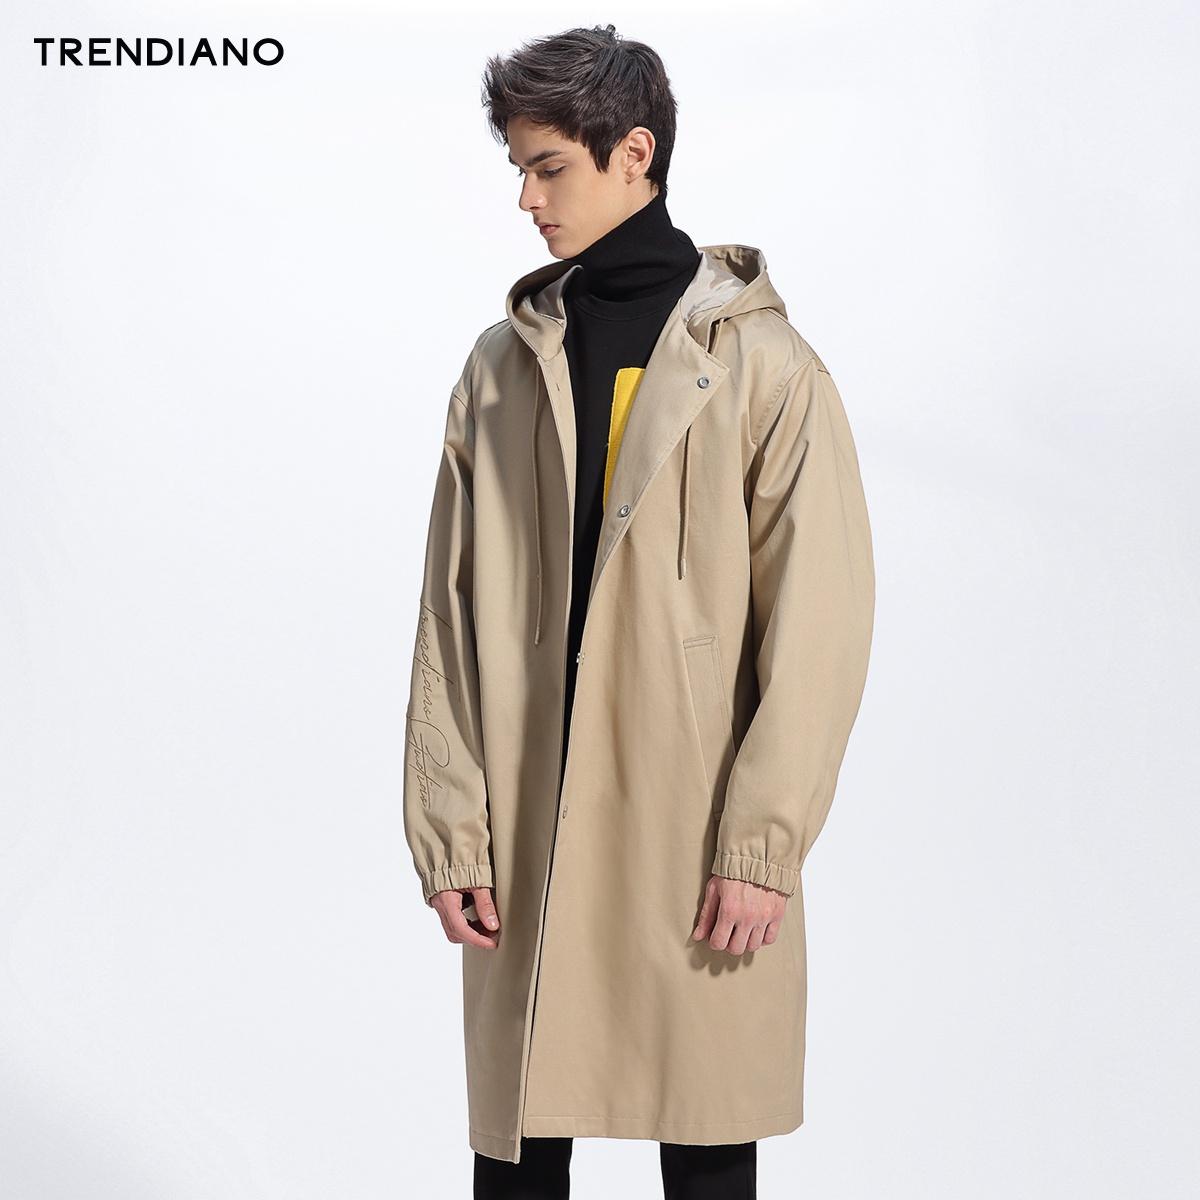 TRENDIANO新2018男装春装潮长款宽松连帽纯棉风衣外套3GE1046840